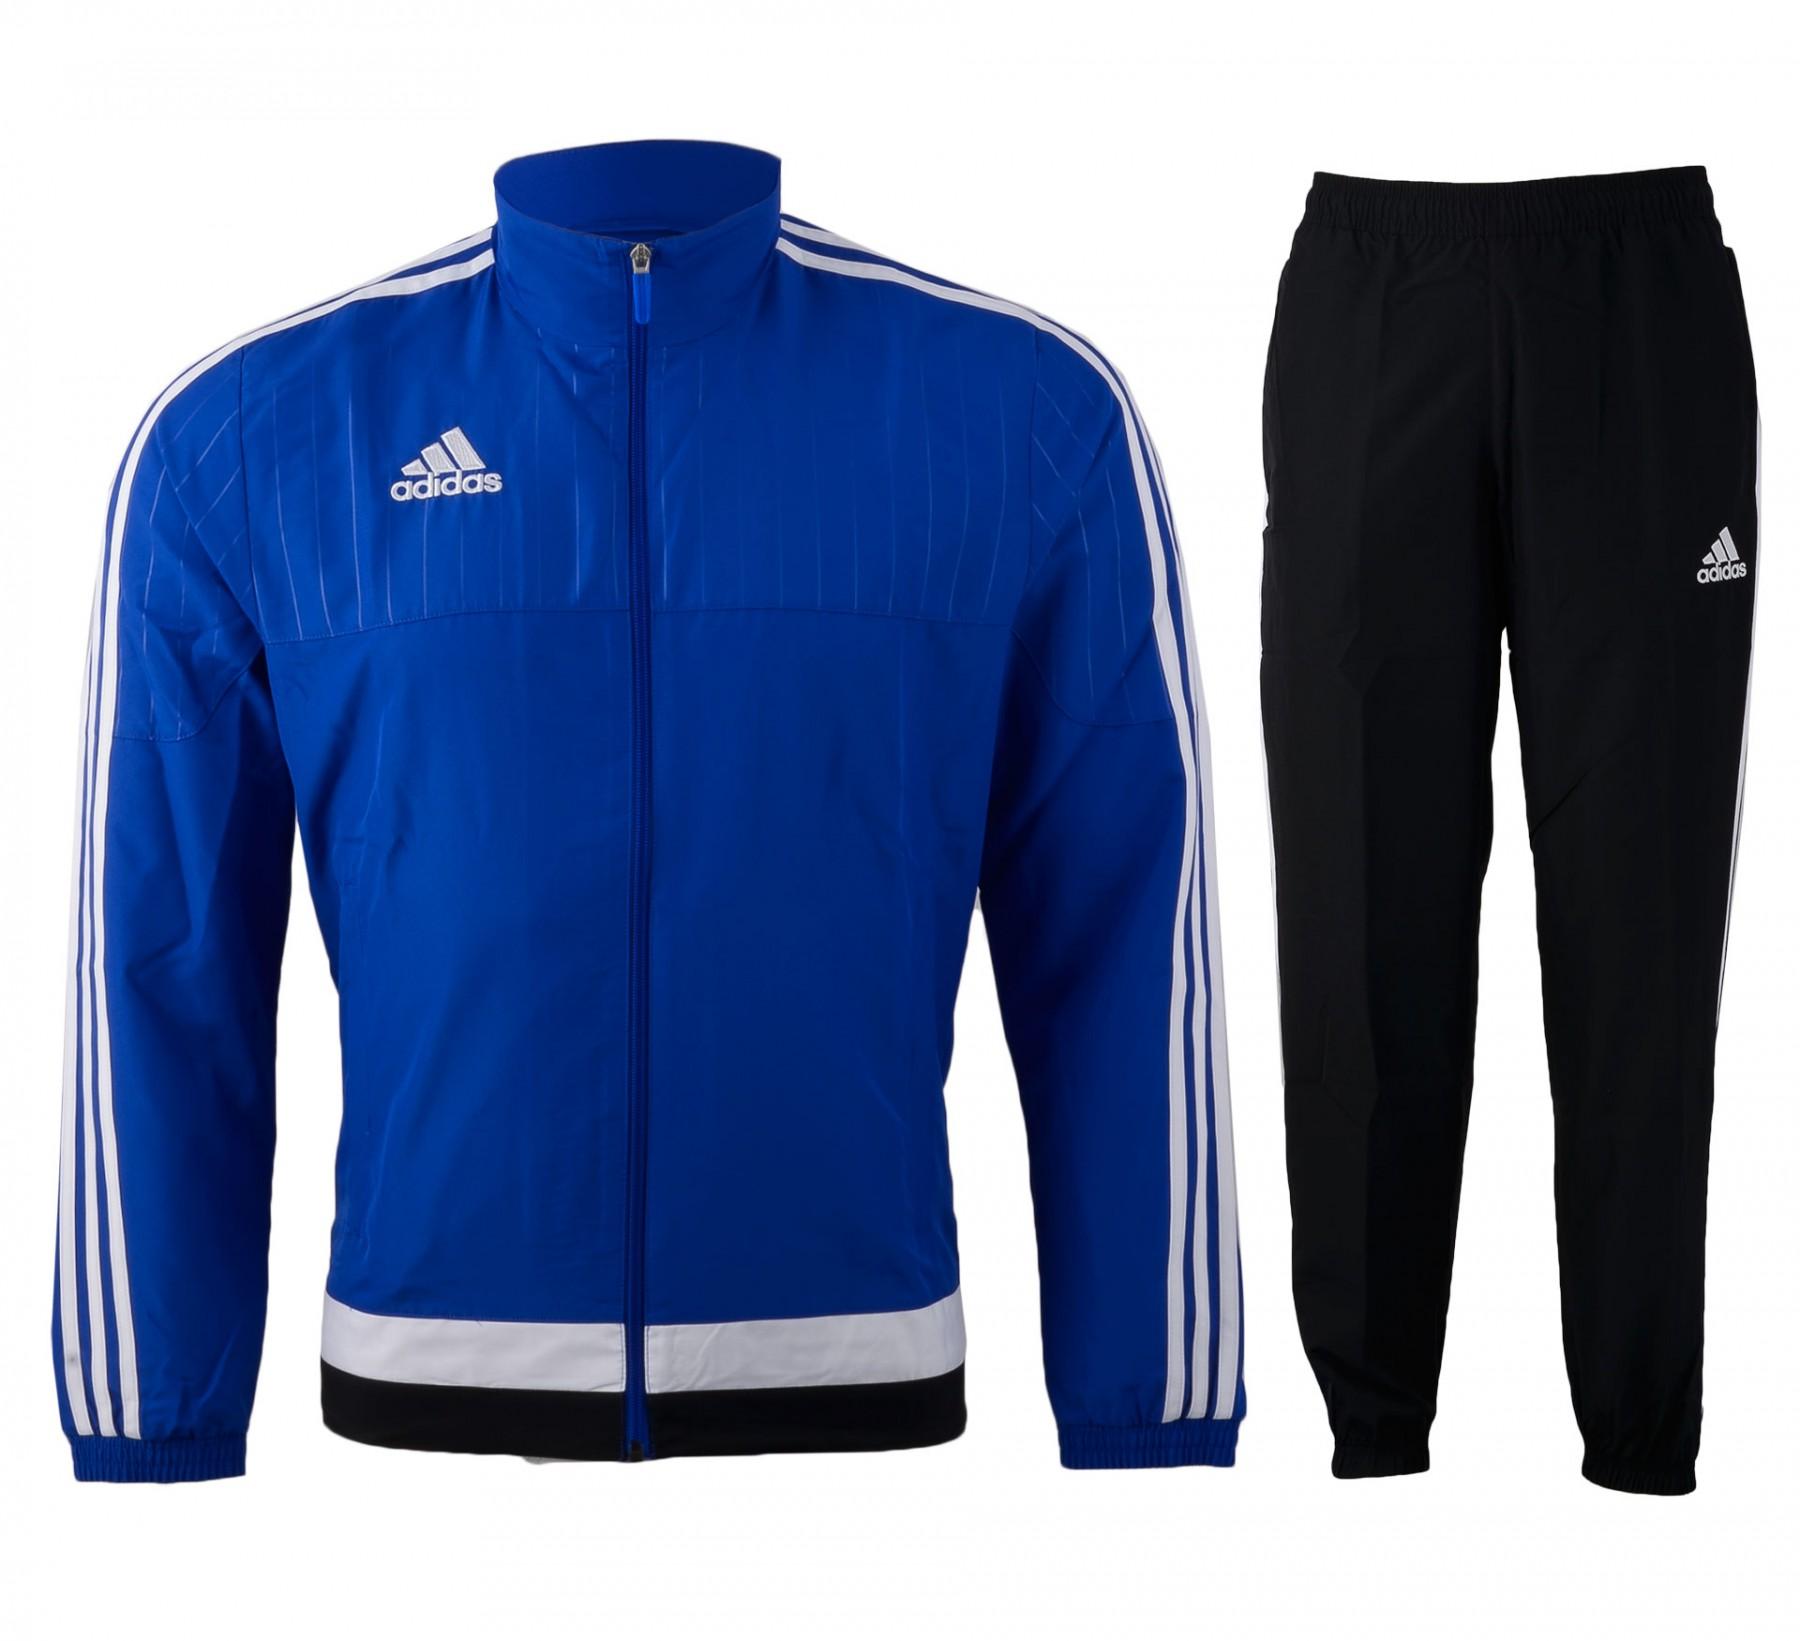 Adidas sport bag TIRO 15 (L) Accessories